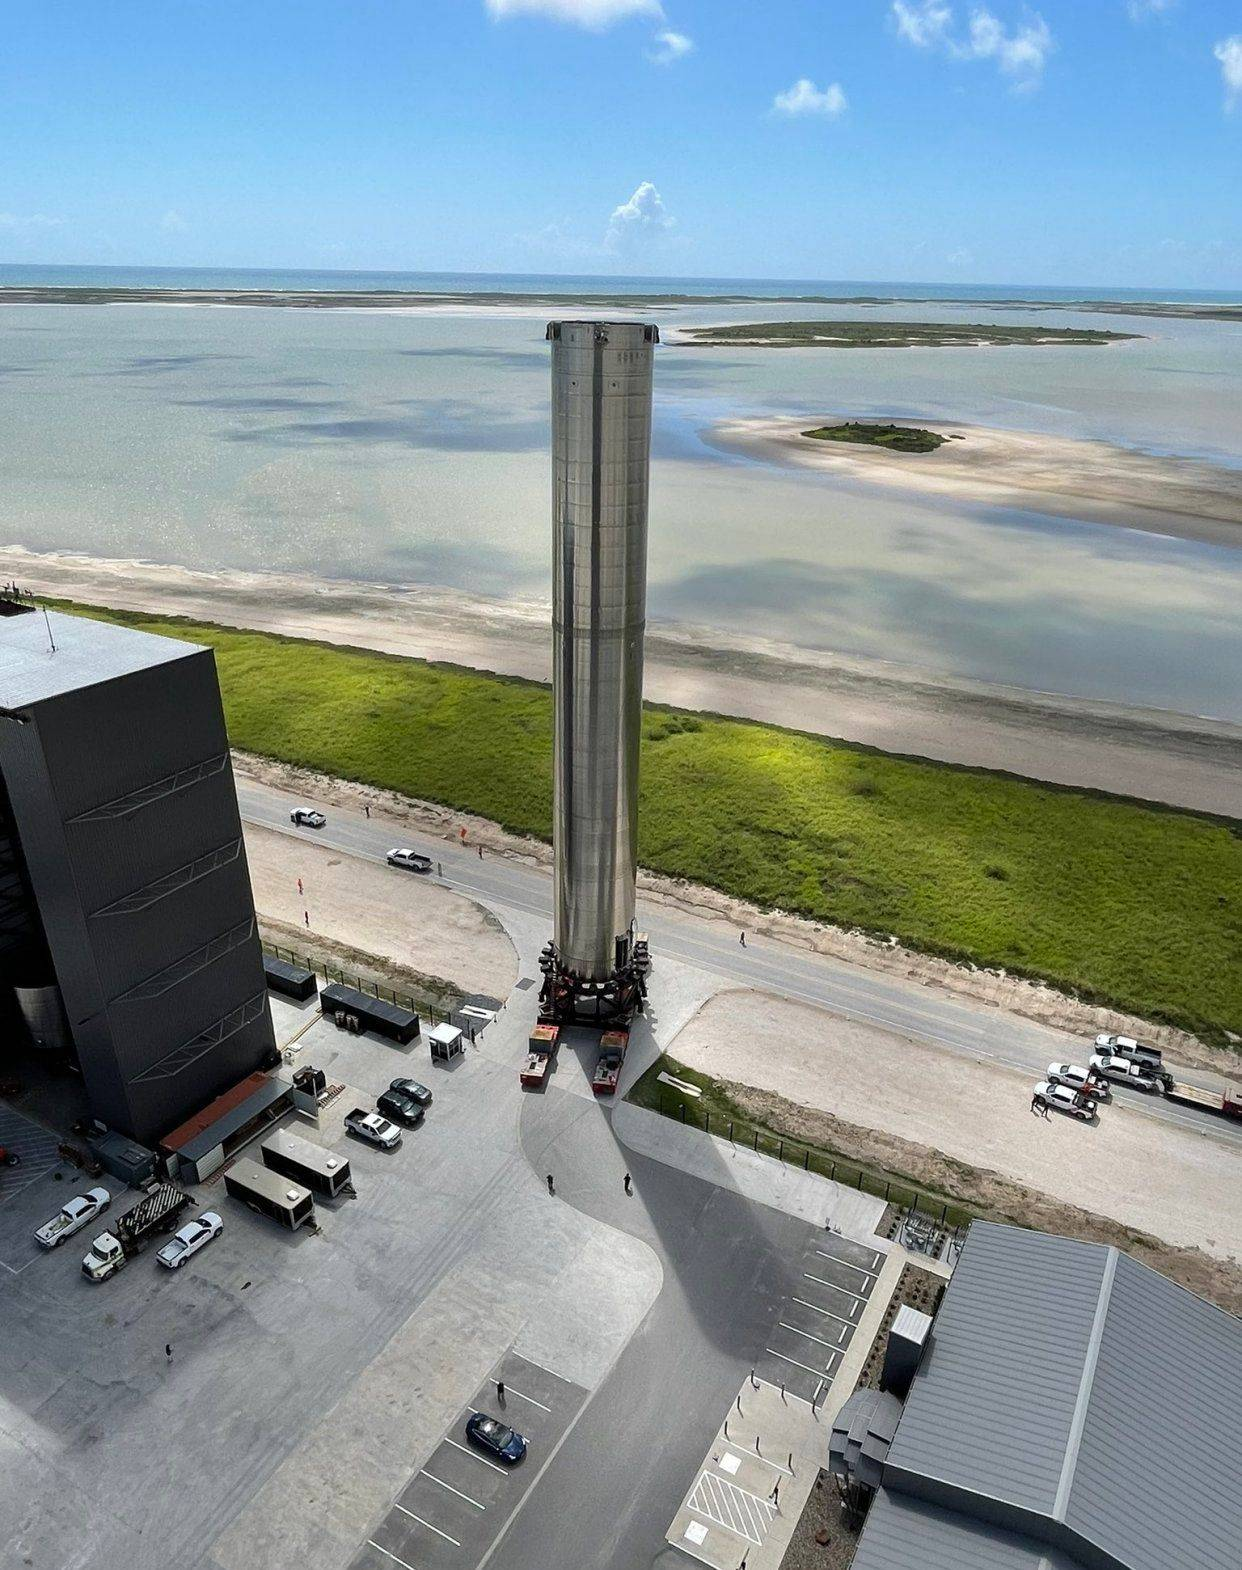 SpaceX建造了有史以来最大的火箭助推器,高65米可装载3100吨液氮